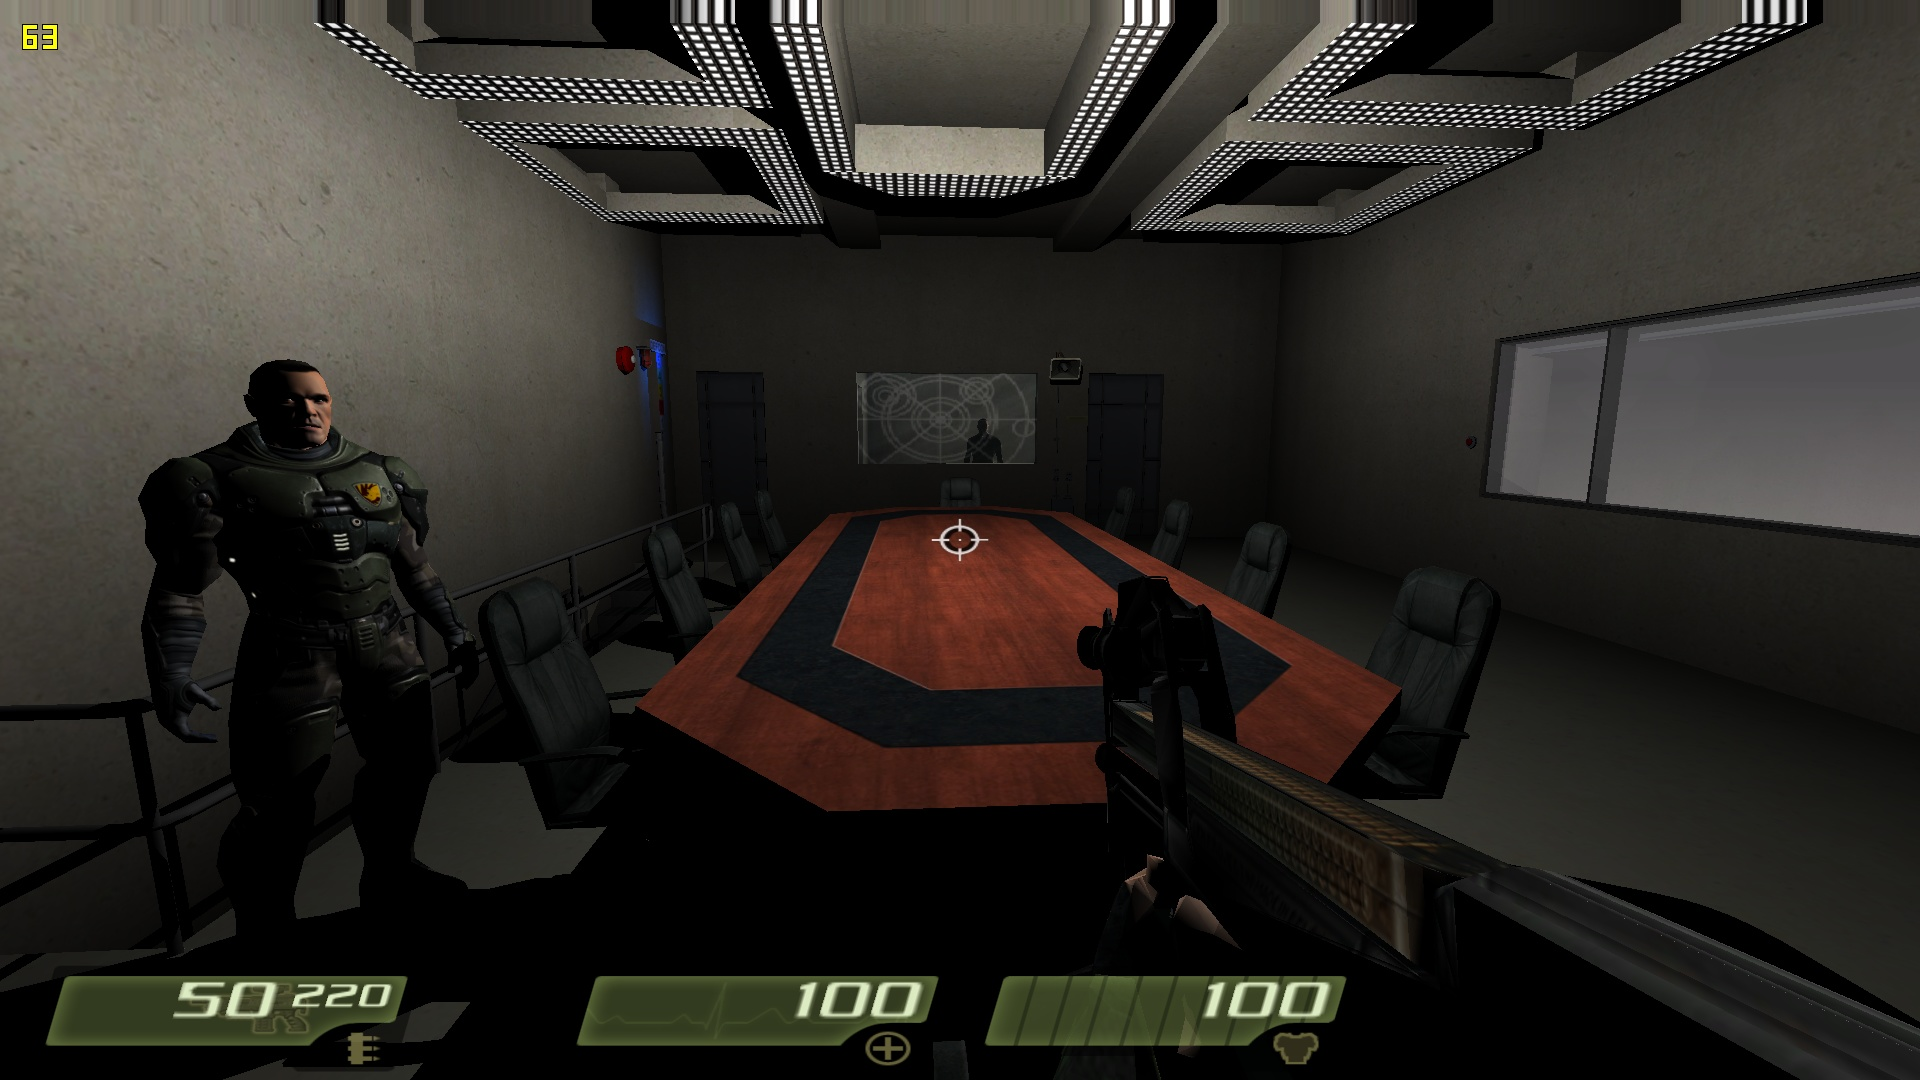 SGC briefing room image - Stargate mod for Quake 4 for ...